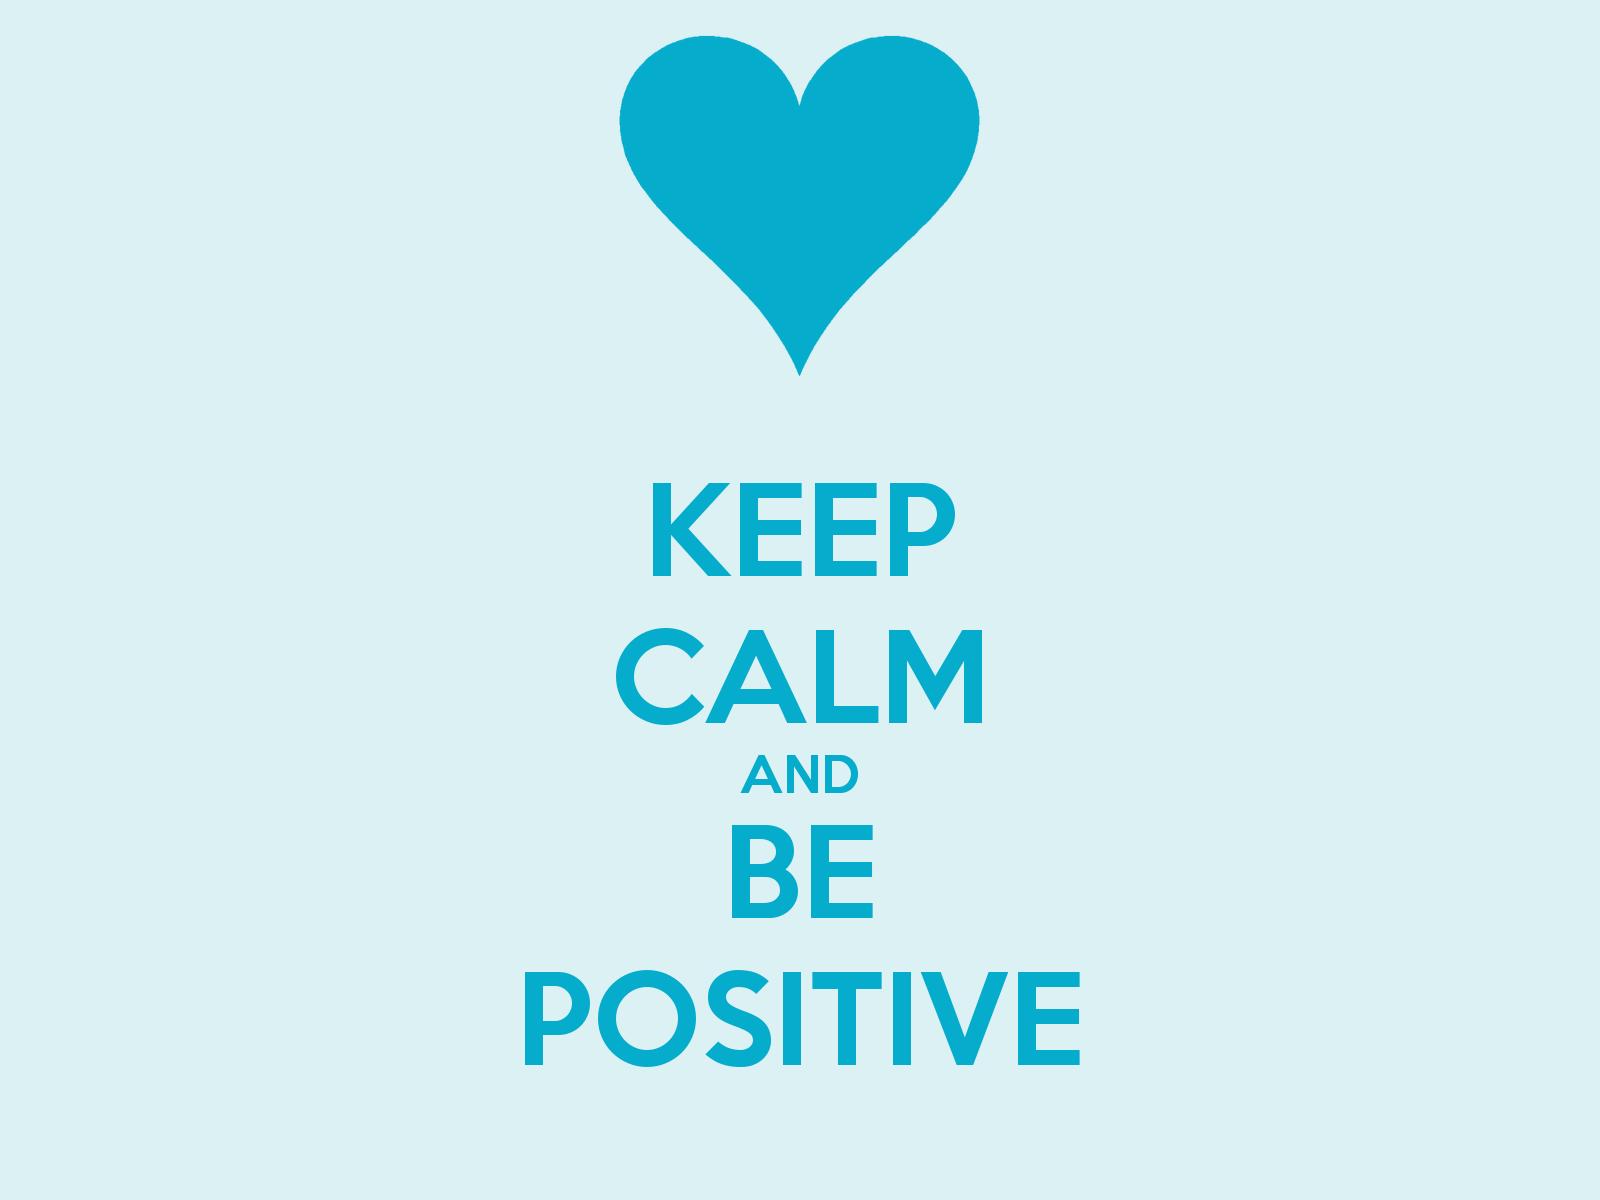 positivity plan